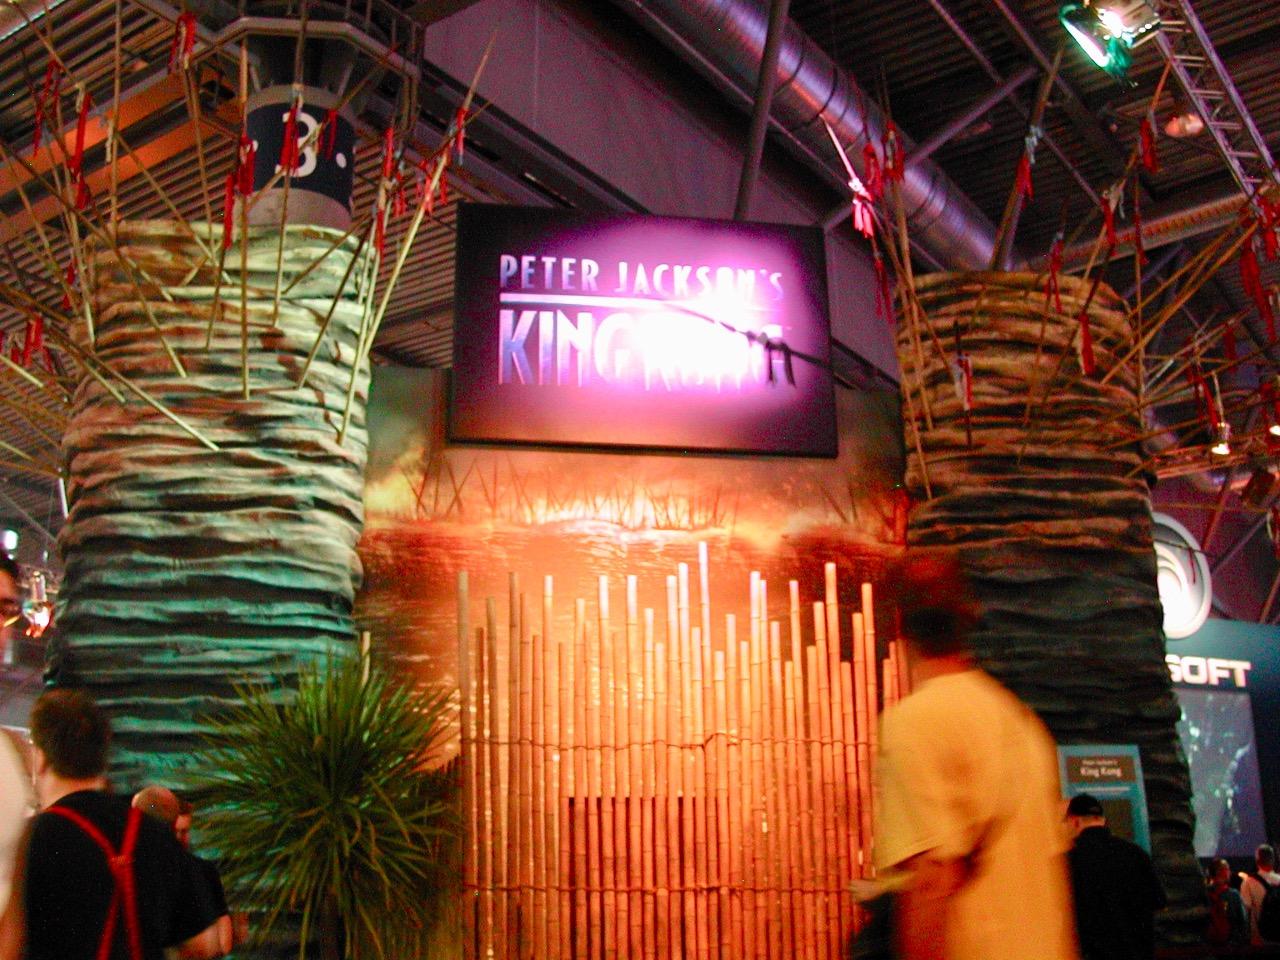 Der Stand von Peter Jackson's King Kong. (Bild: André Eymann)